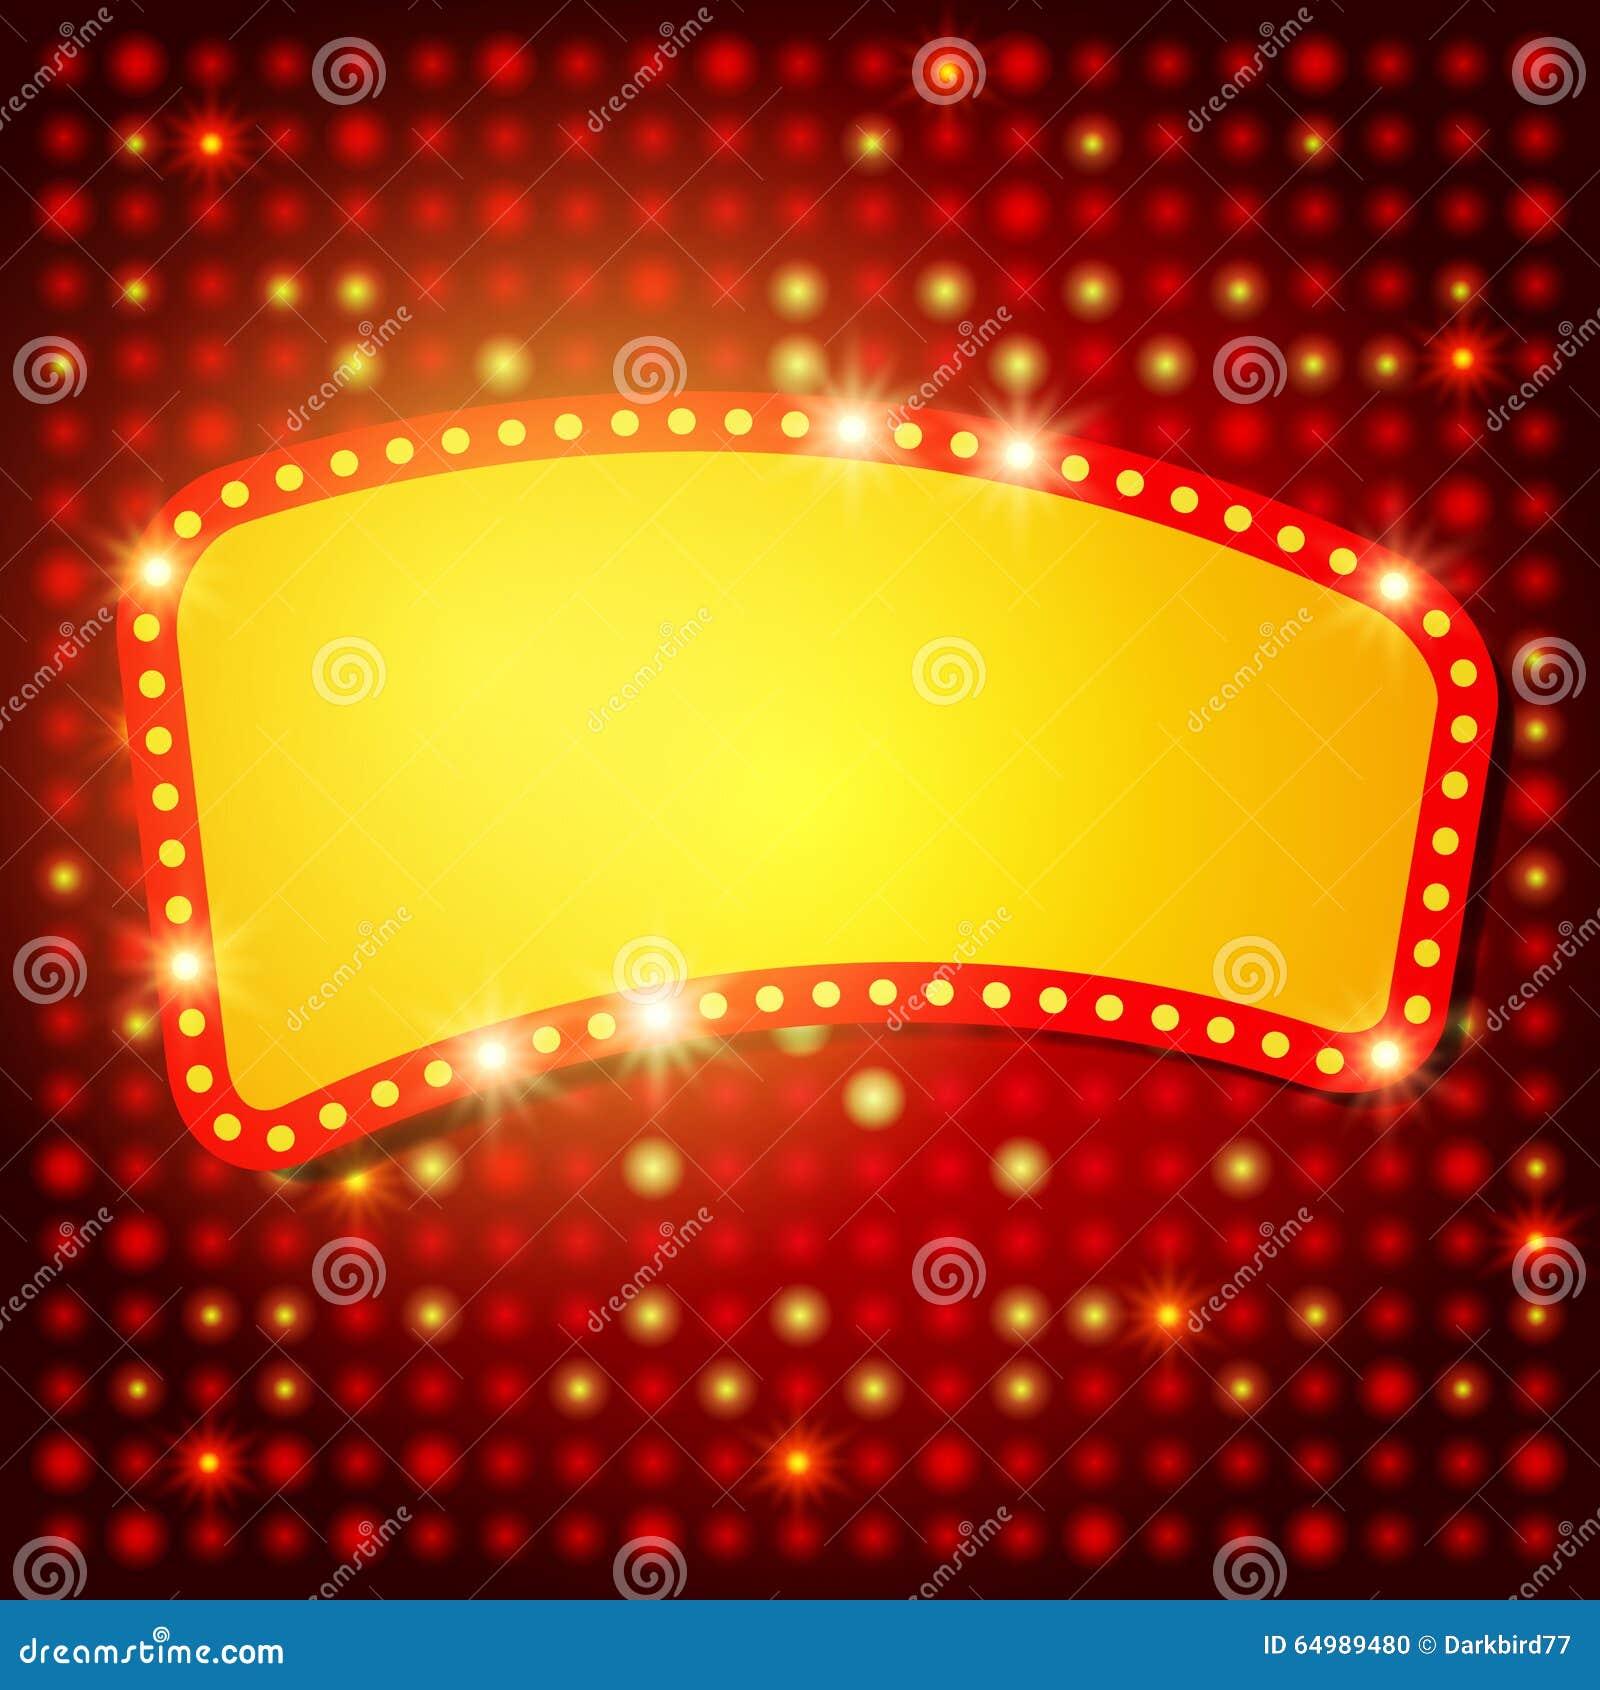 Shining Background With Retro Casino Light Banner Stock